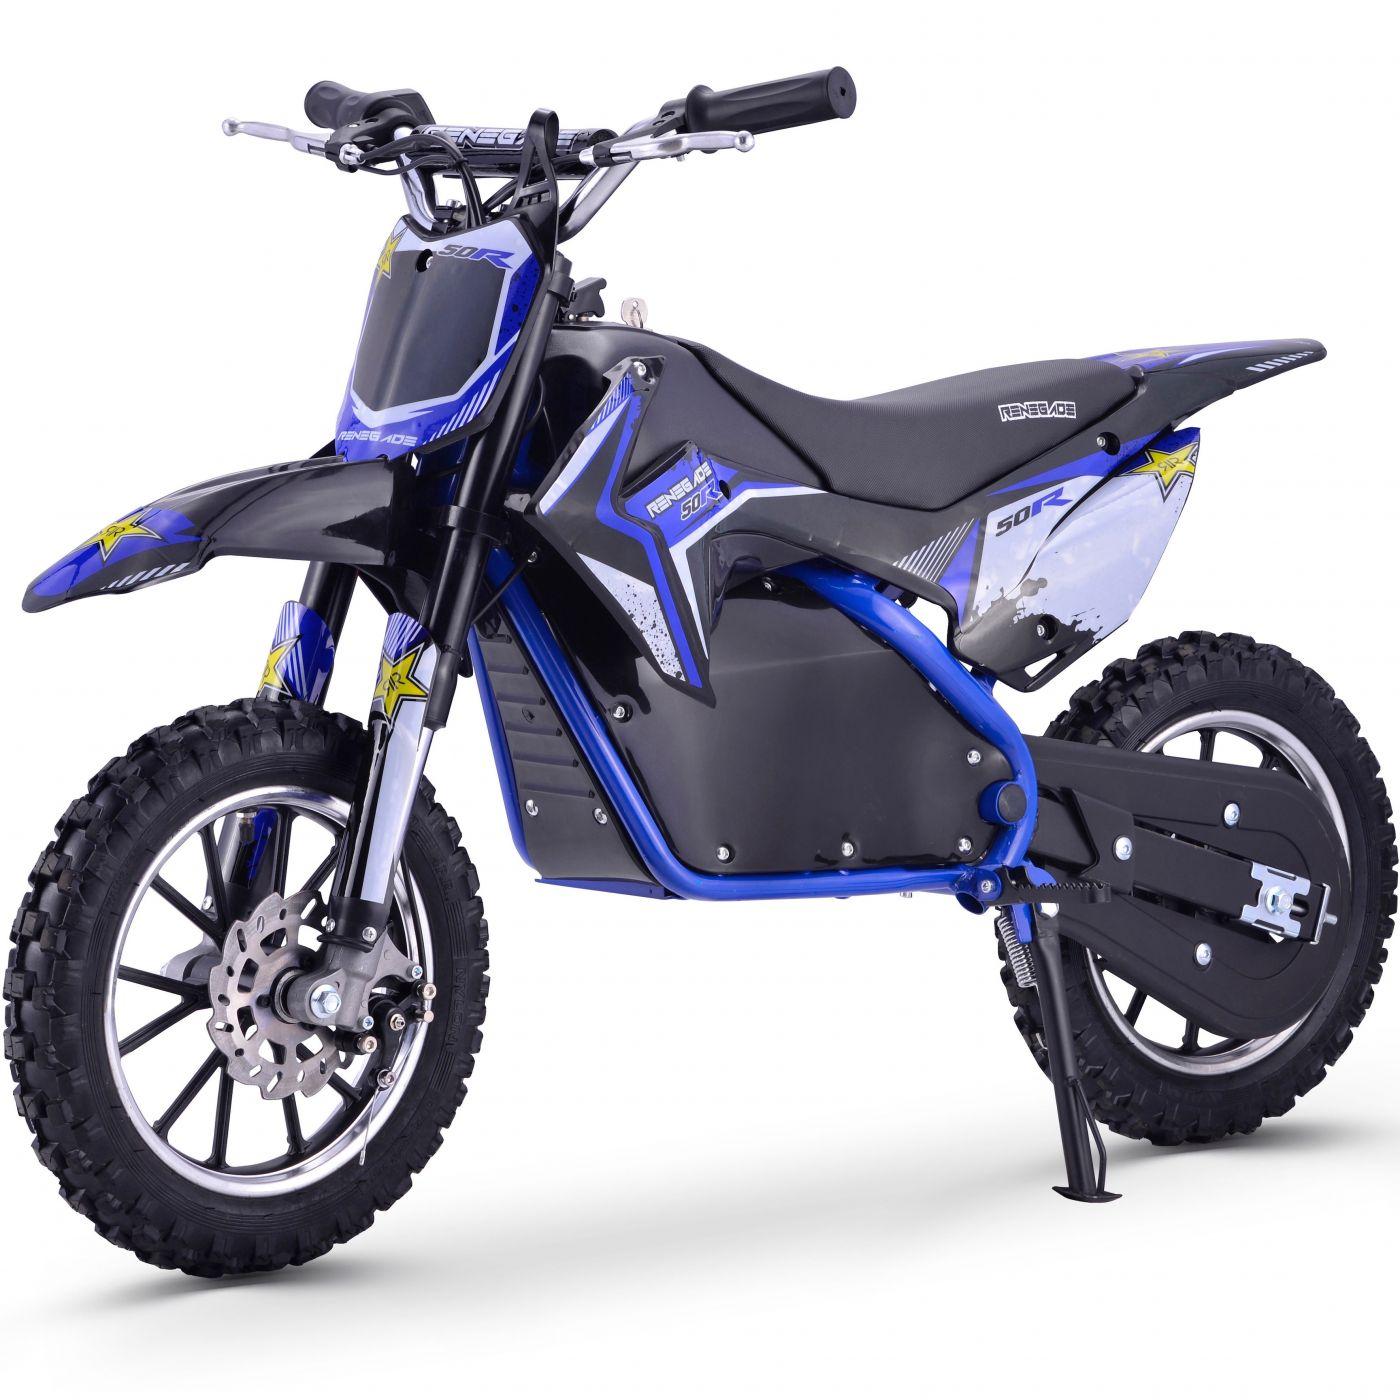 Renegade 50R 500W 36V Electric Mini Dirt Bike - Blue